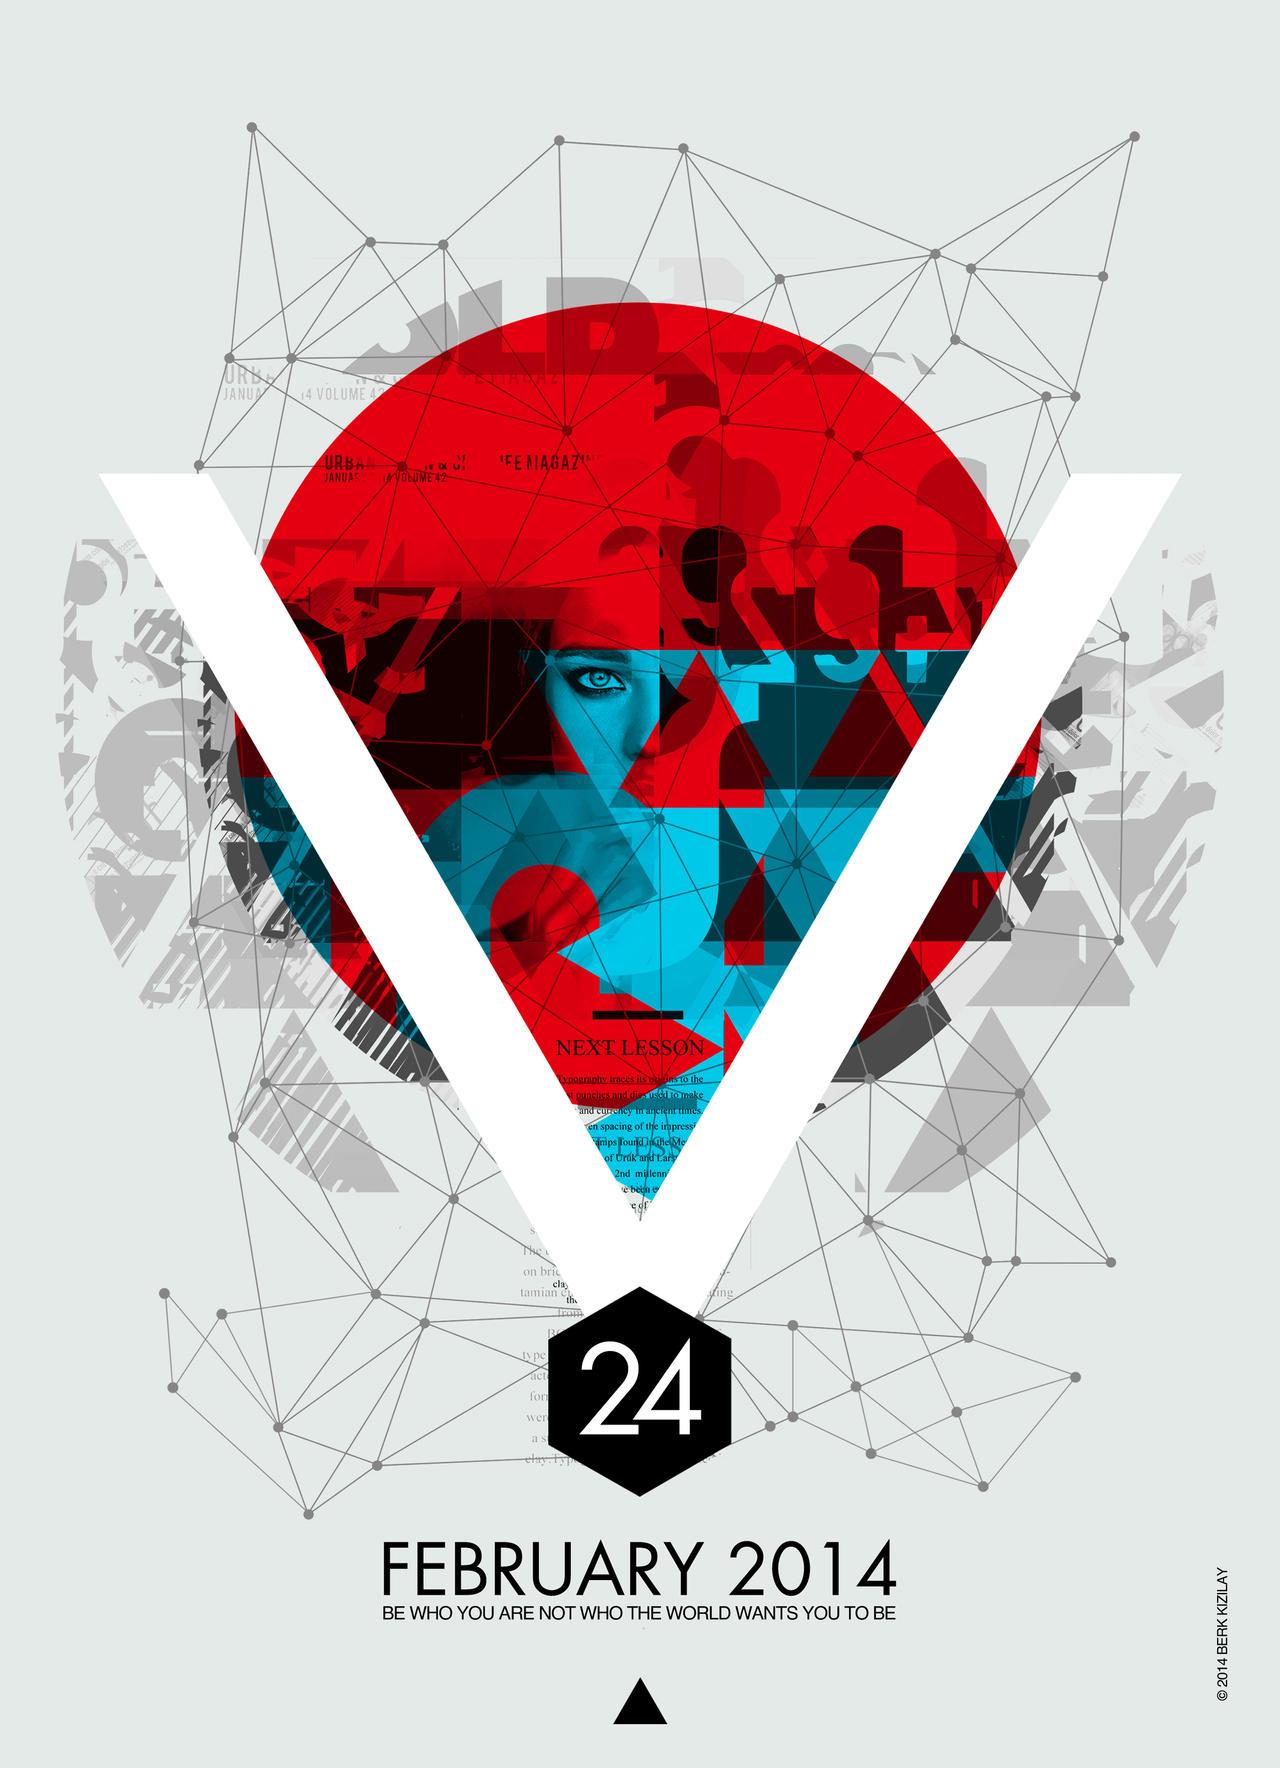 24POWER